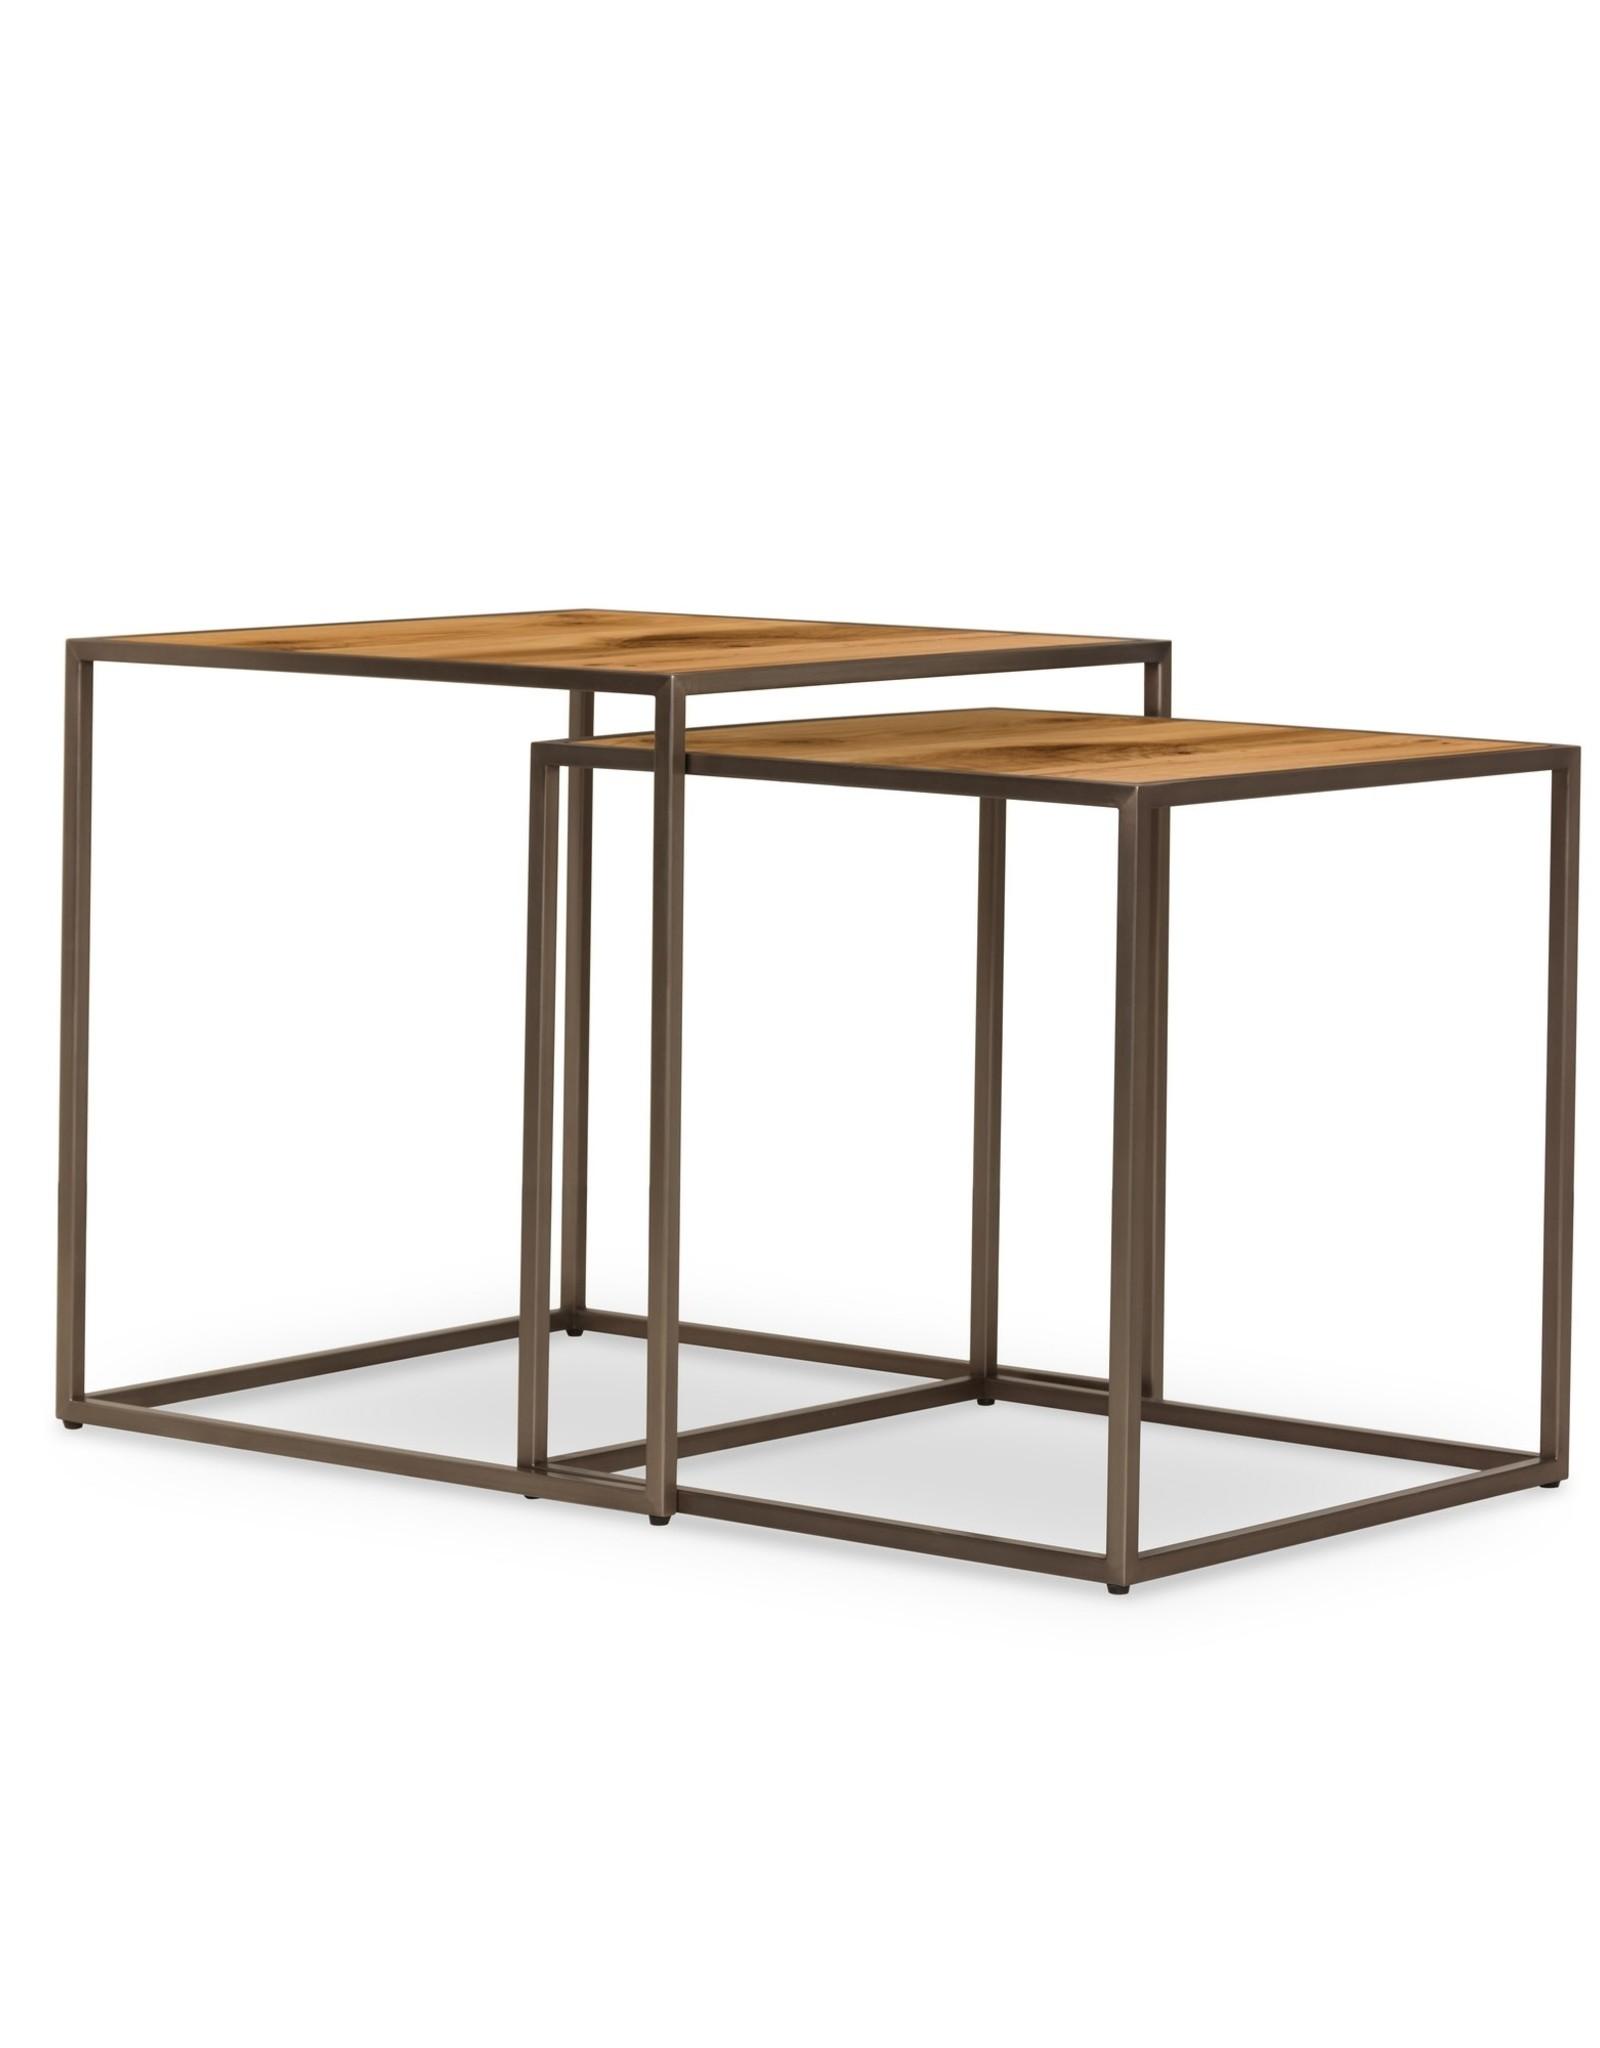 Kenzo Nesting Tables - Set of 2